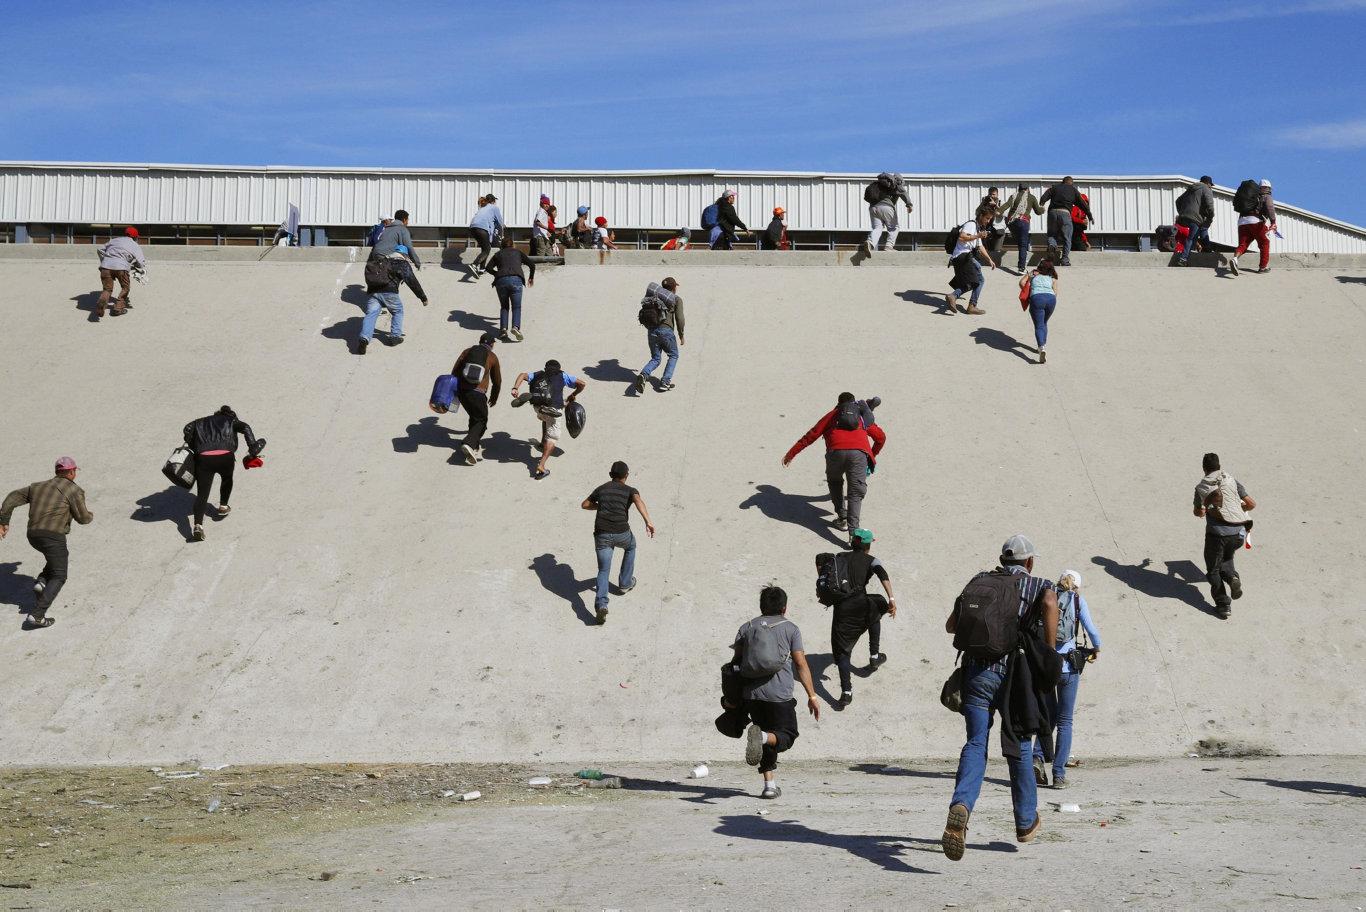 Migrants from Central America climb a steep embankment in Tijuana, Mexico, toward the U.S. border checkpoint.